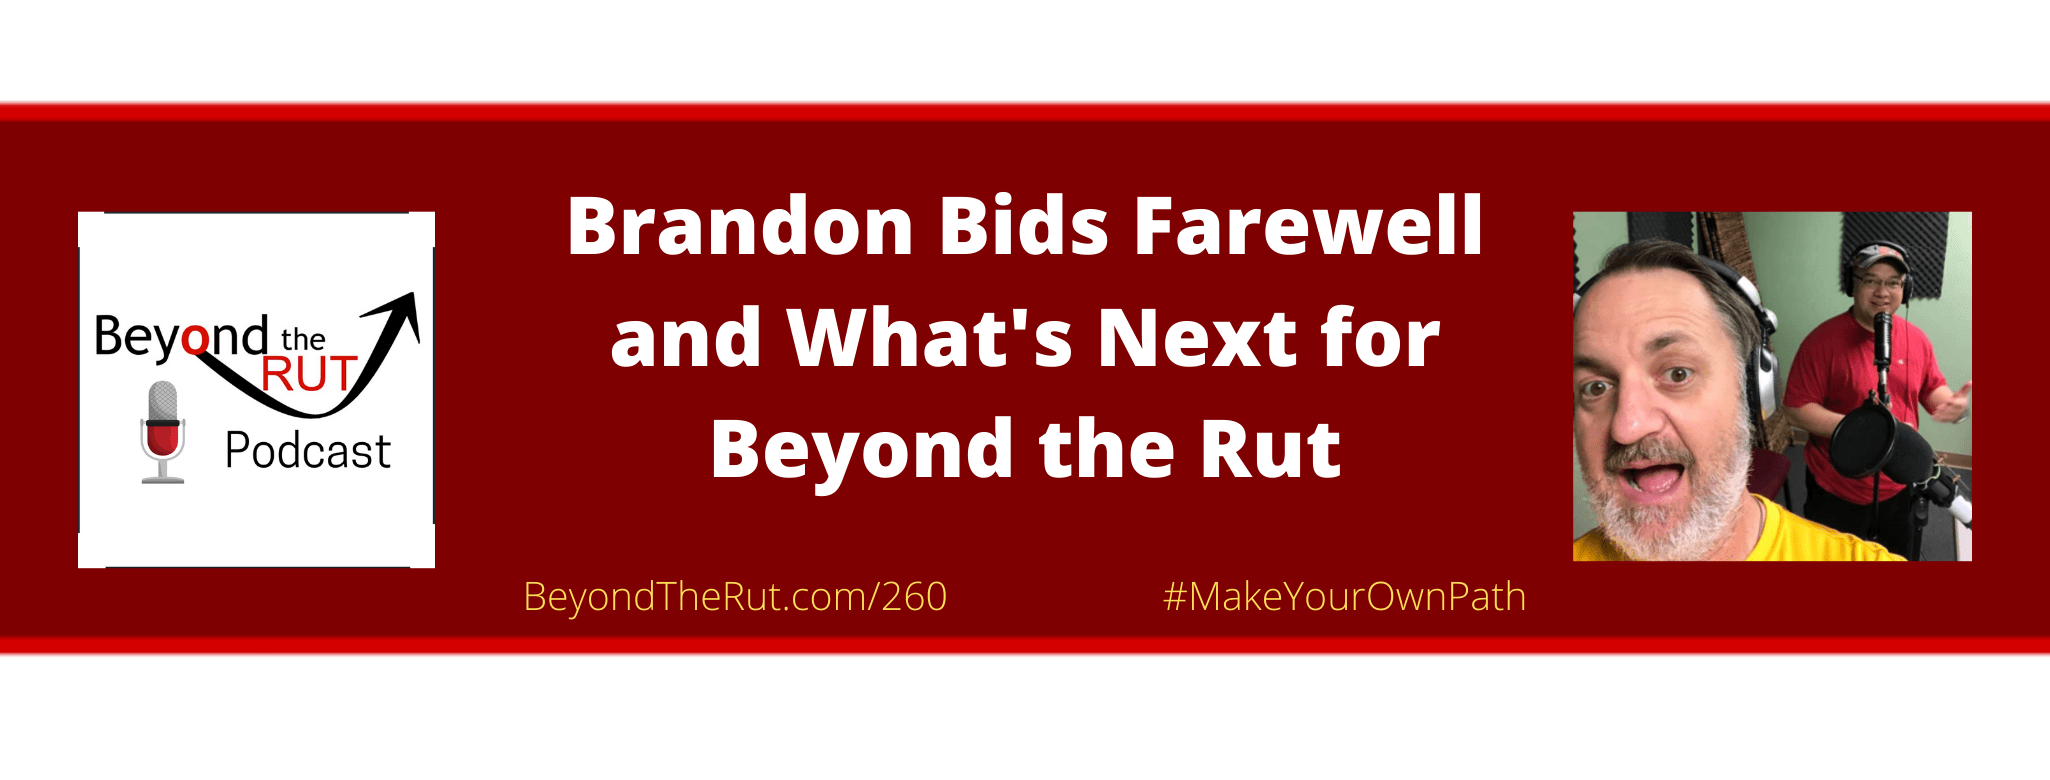 Brandon bids farewell to Beyond the Rut